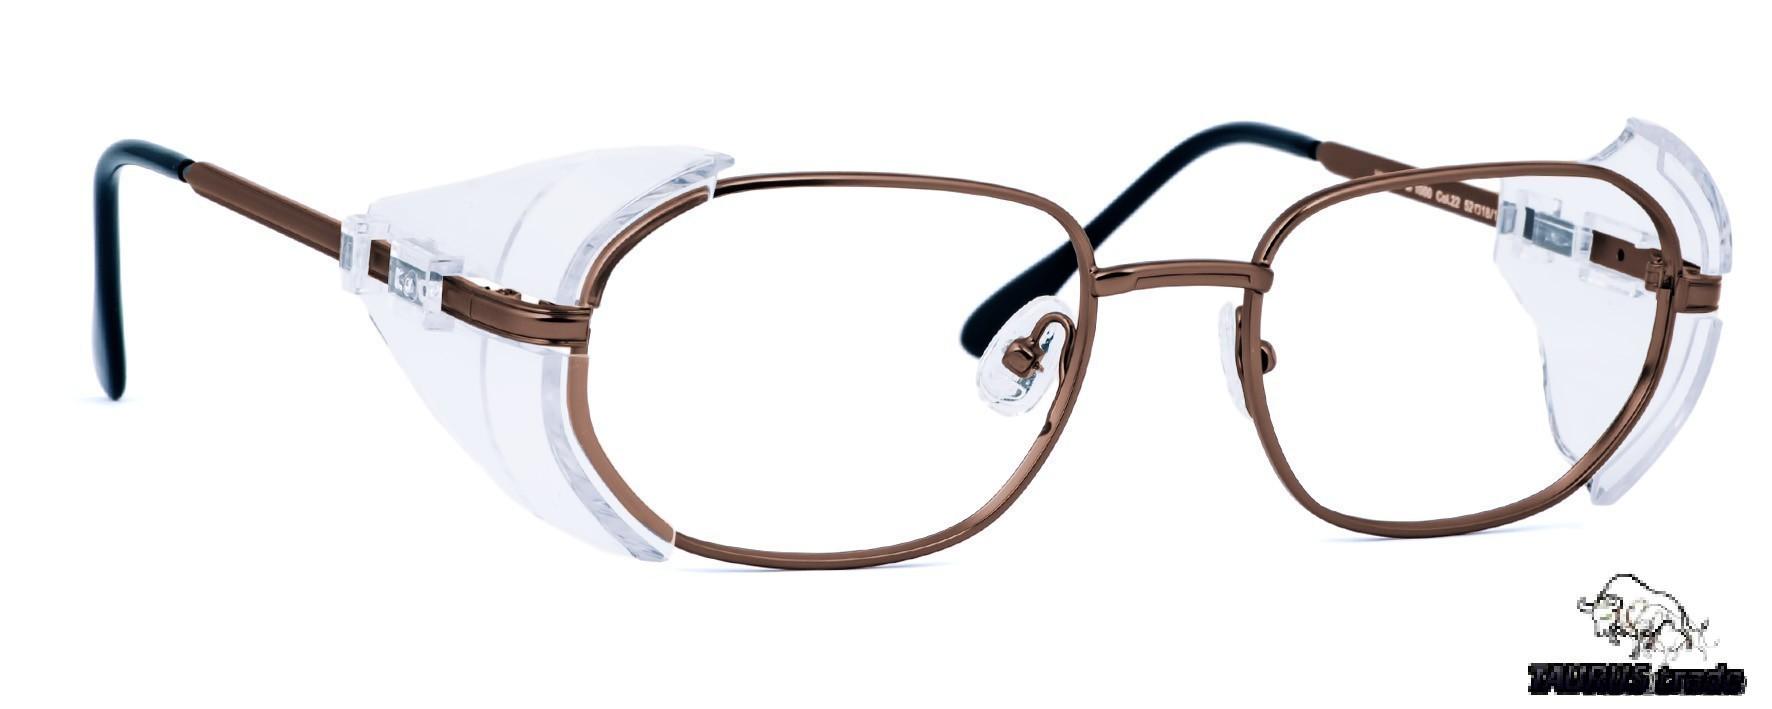 1000-04-5200-VISION-M-1000-Bronze